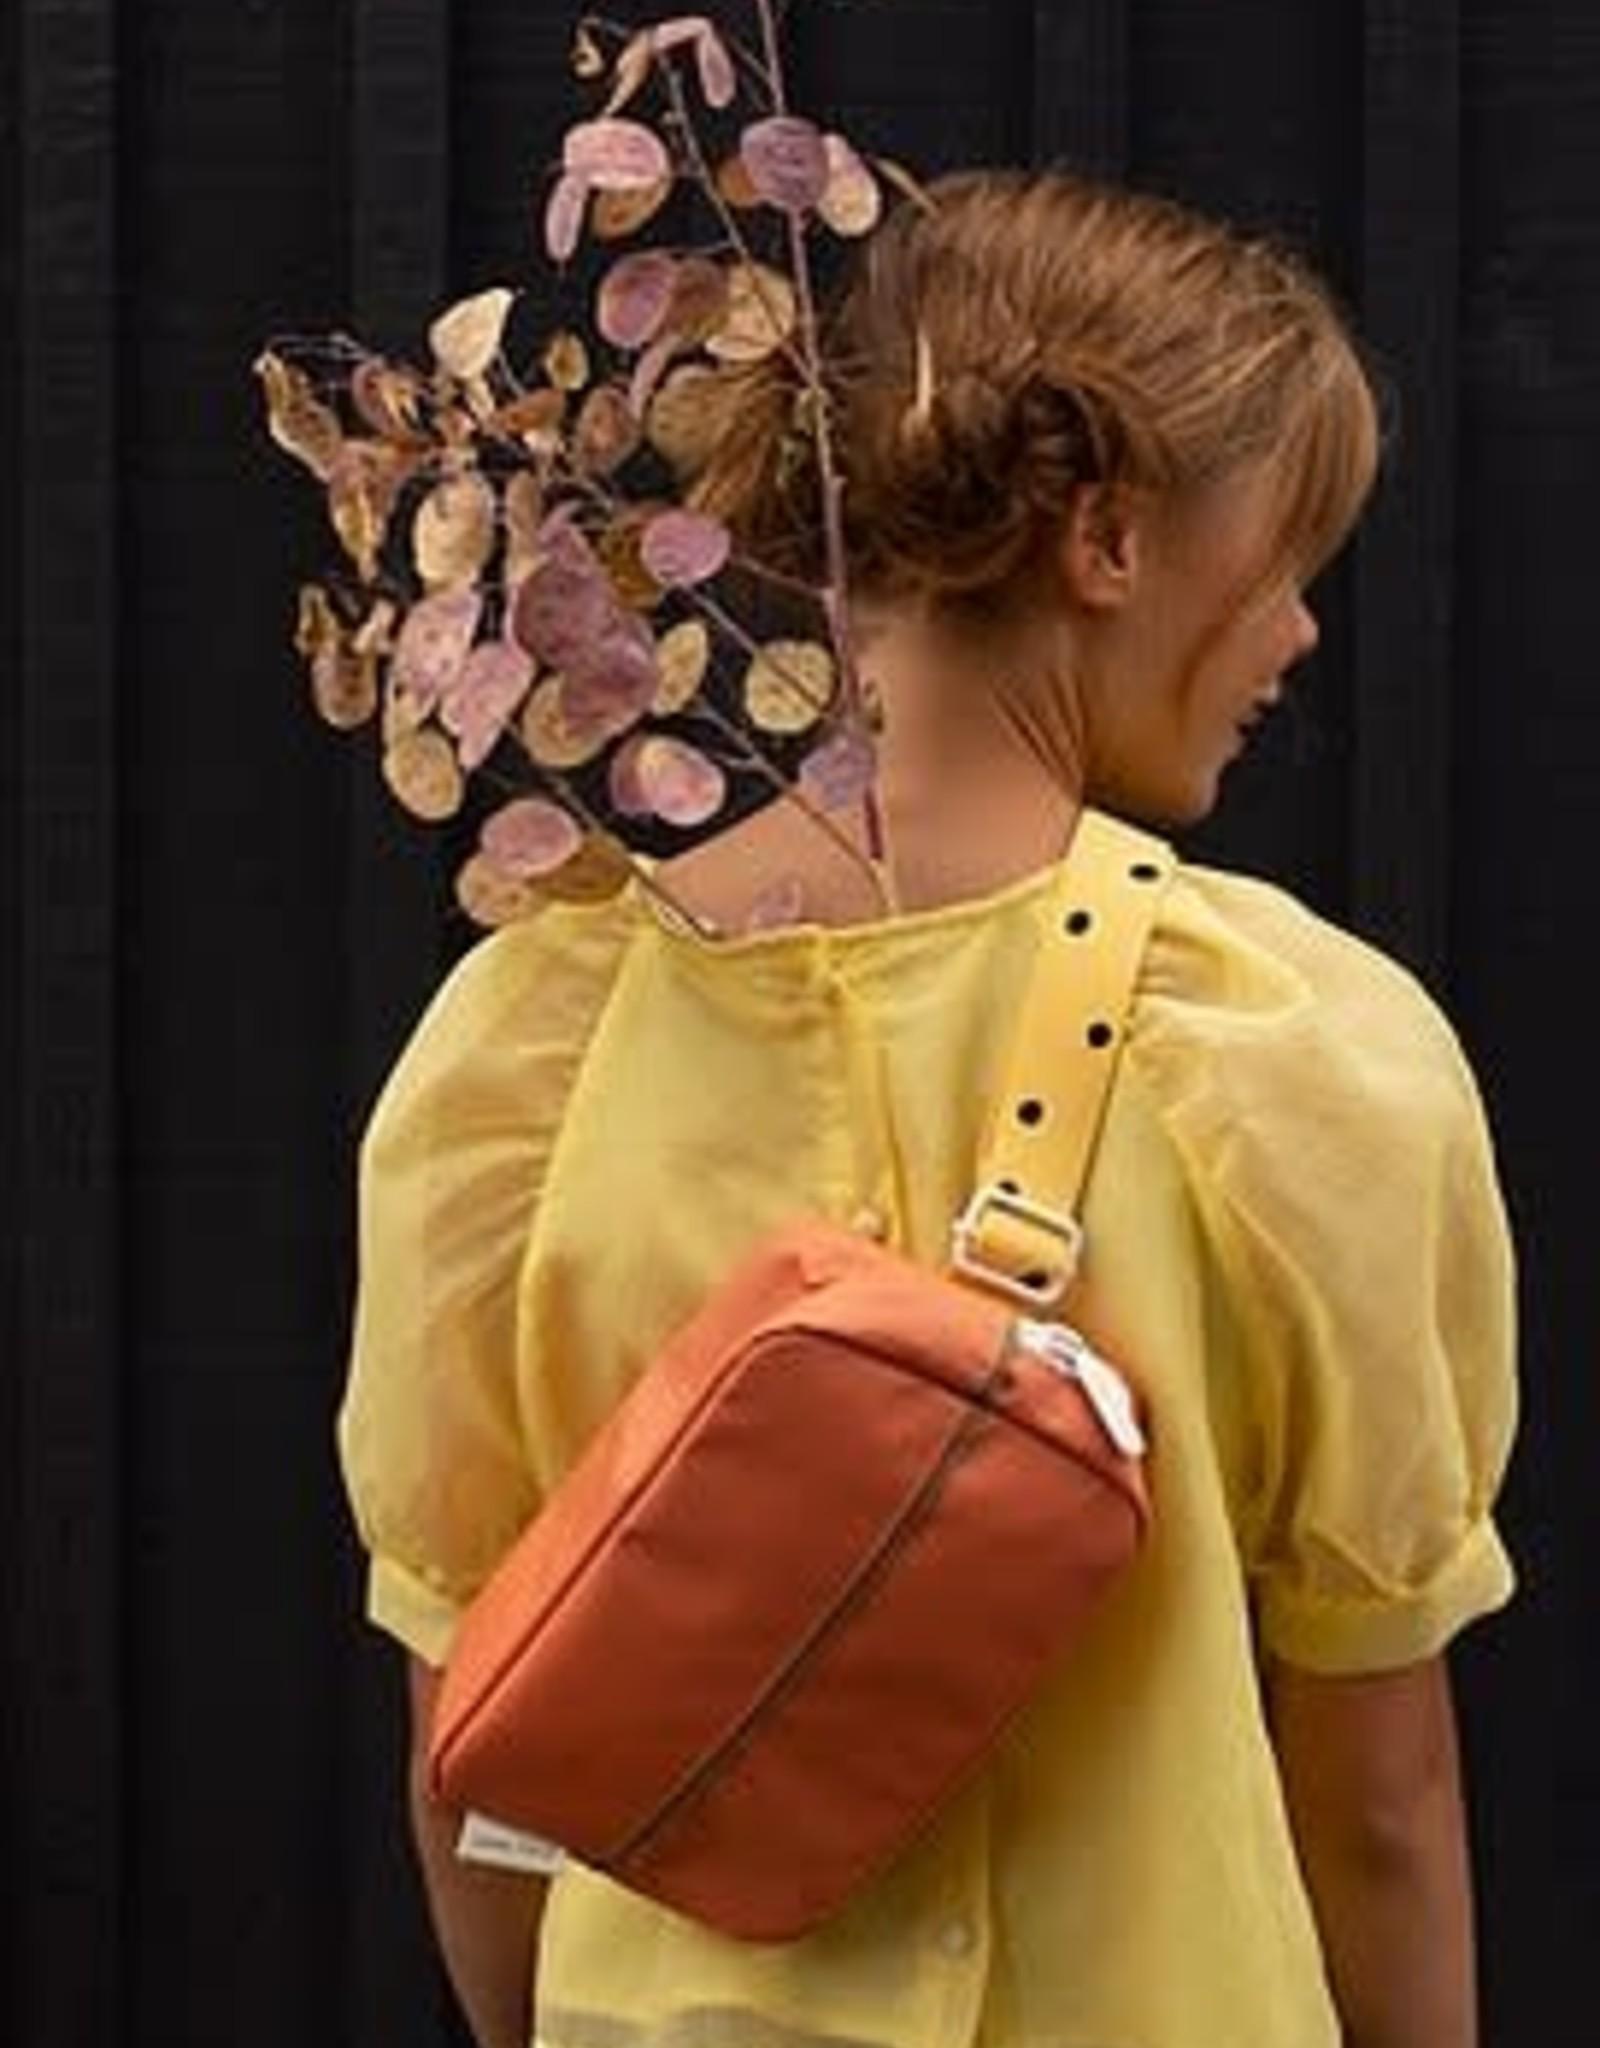 Stick lemon Sticky lemon Fanny pack large freckles candy pink + carrot orange + sunny yellow